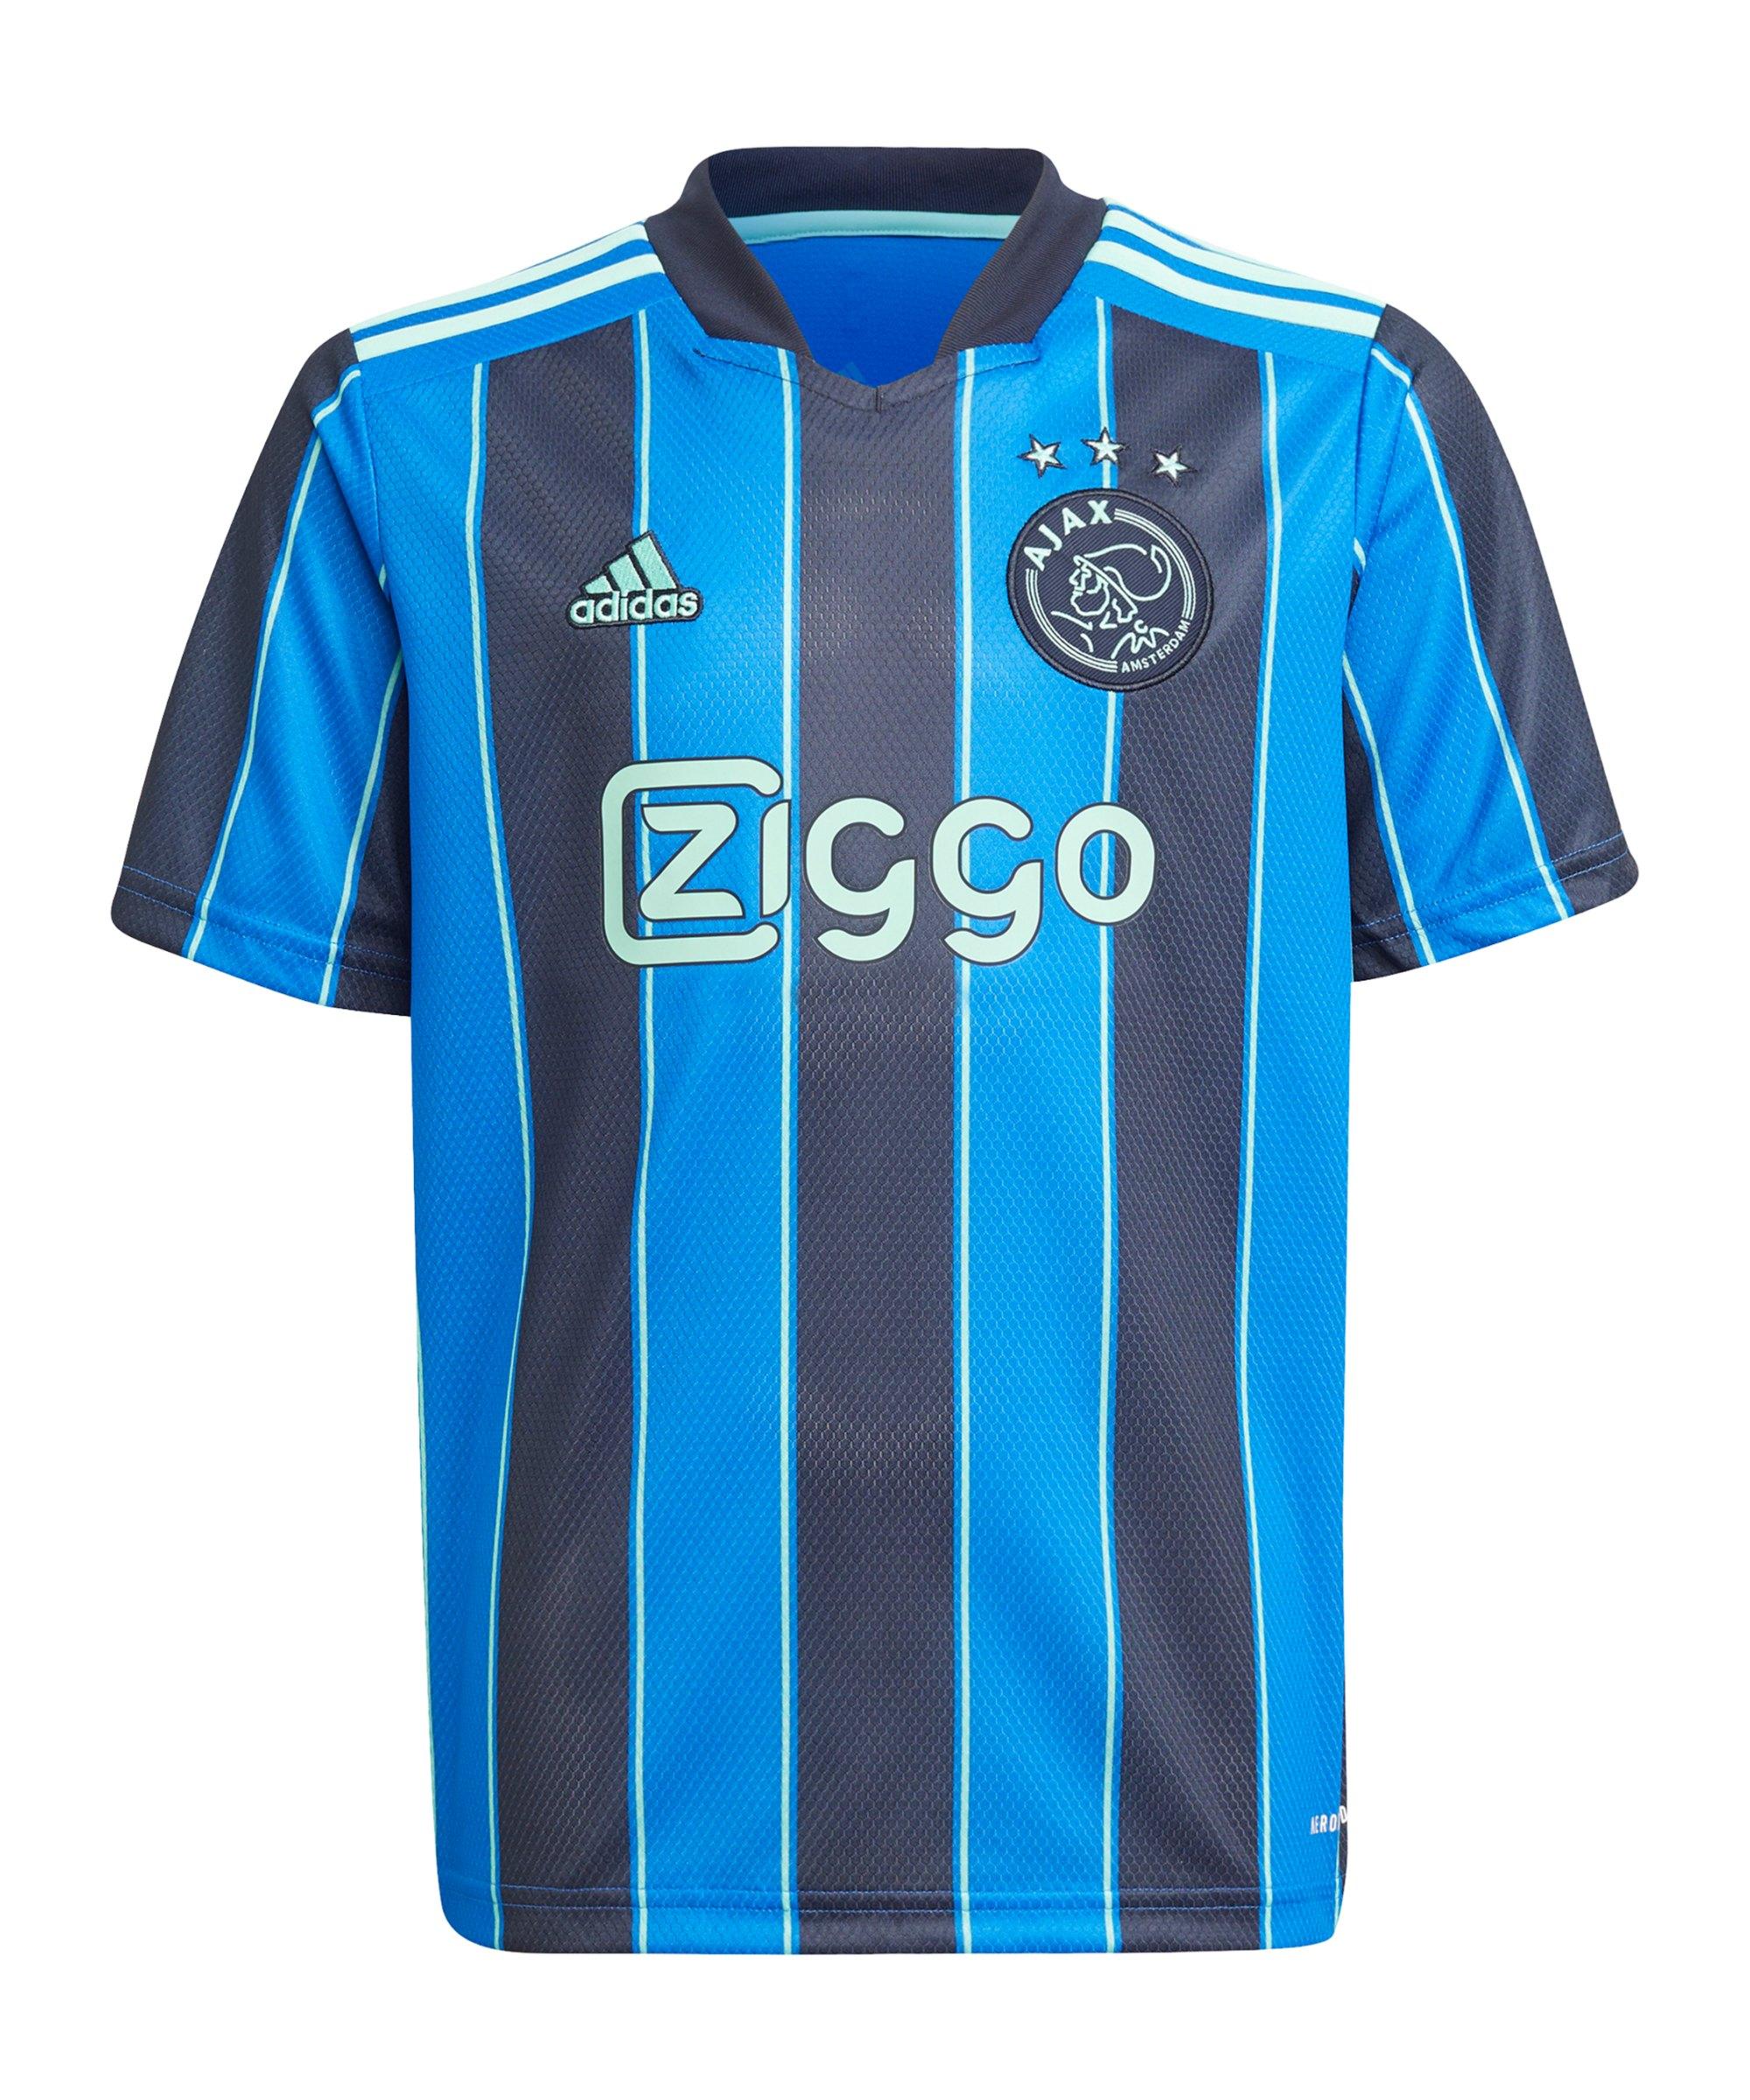 adidas Ajax Amsterdam Trikot Away 2021/2022 Kids Blau - blau